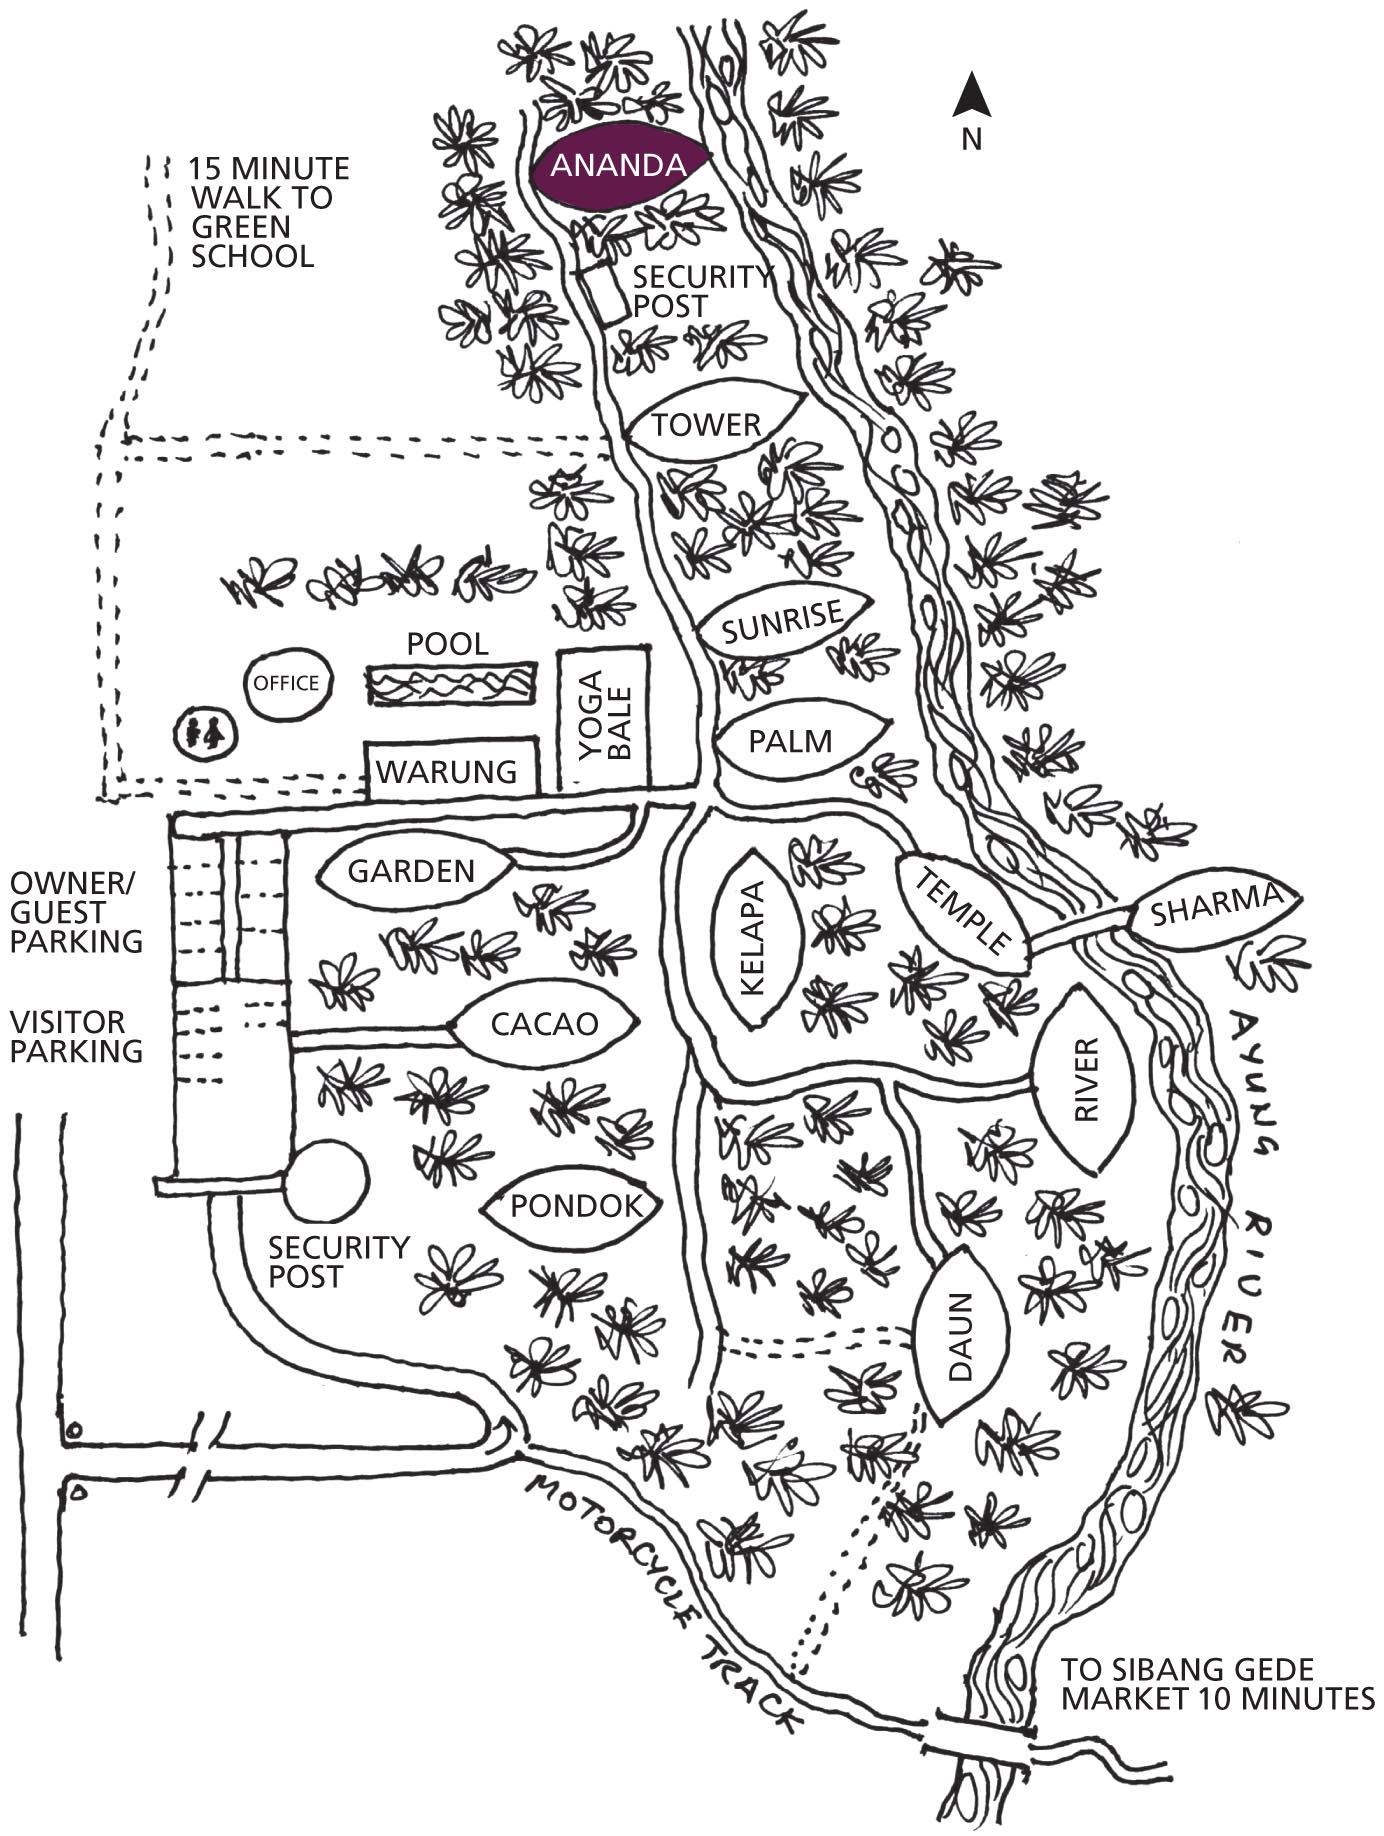 Green village map